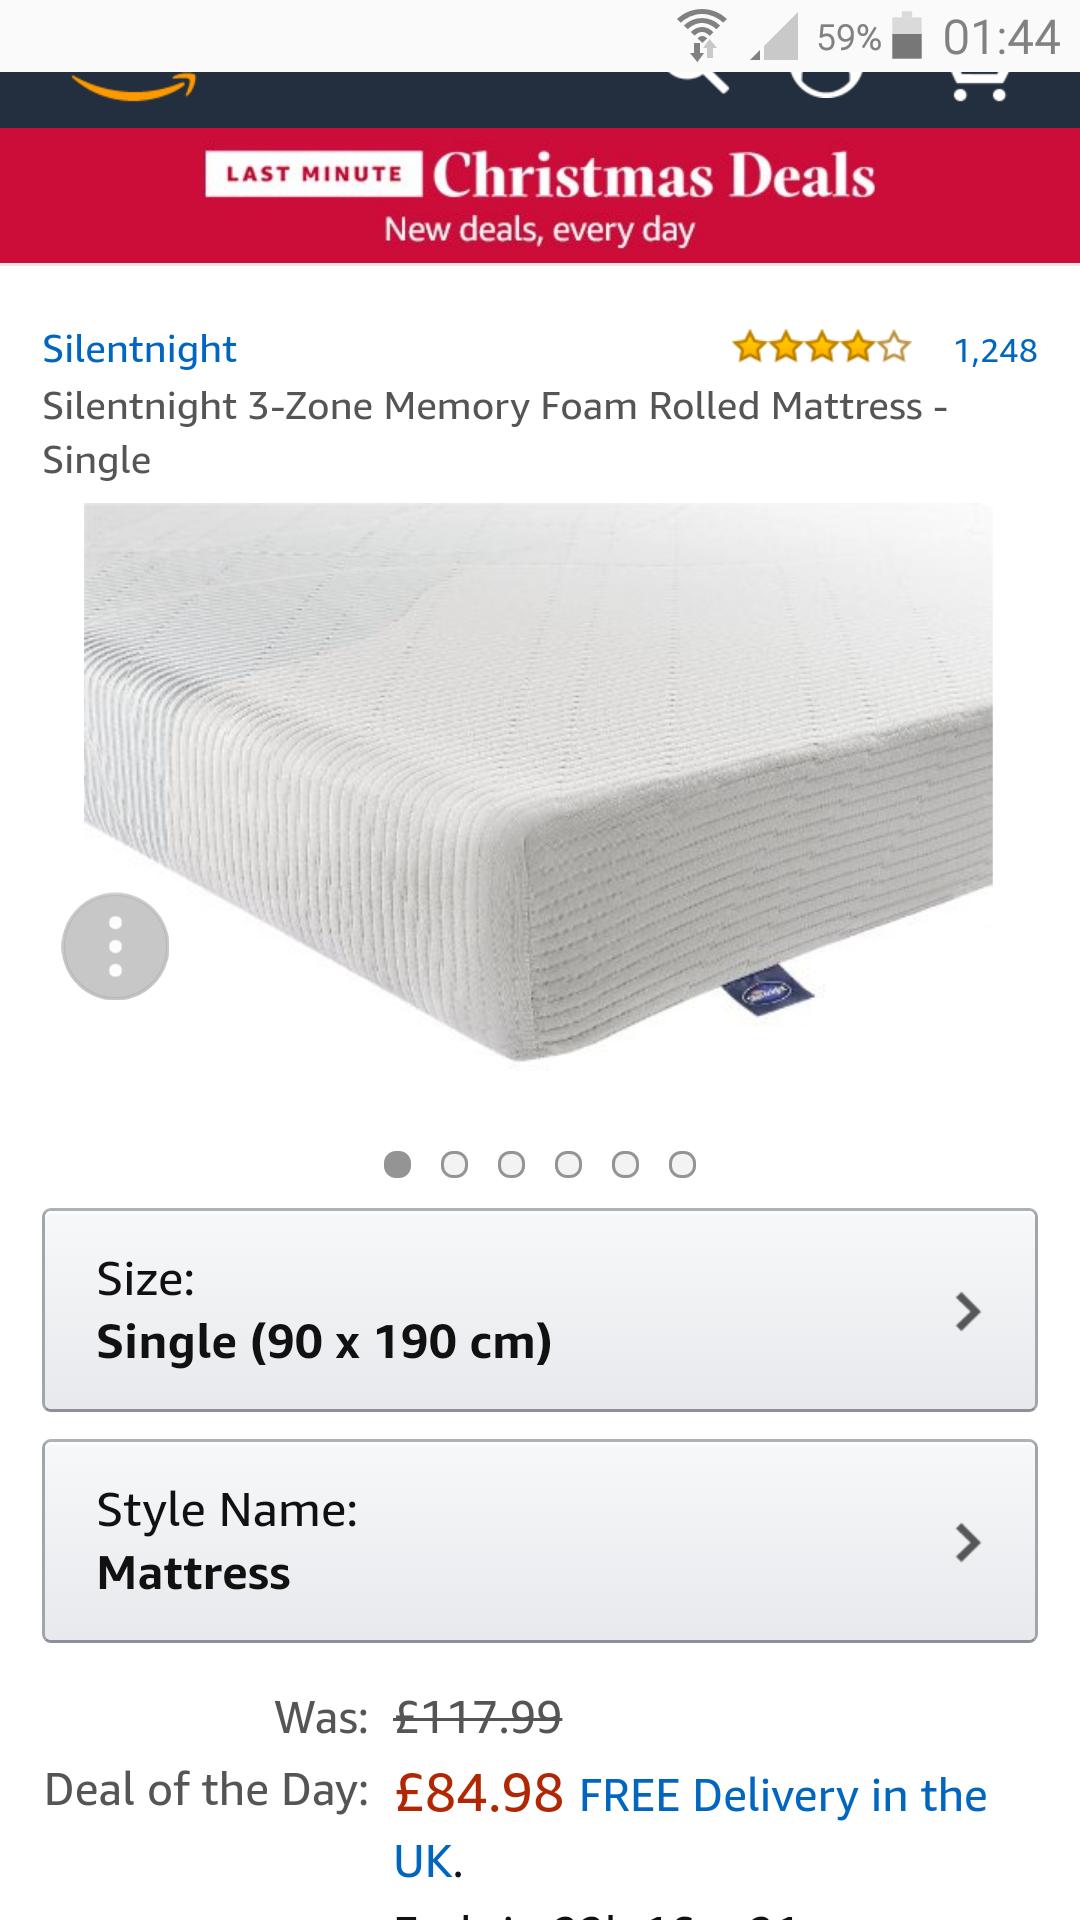 silentnight zone 3 mattress 40%off amazon (DOTD) From £84.98